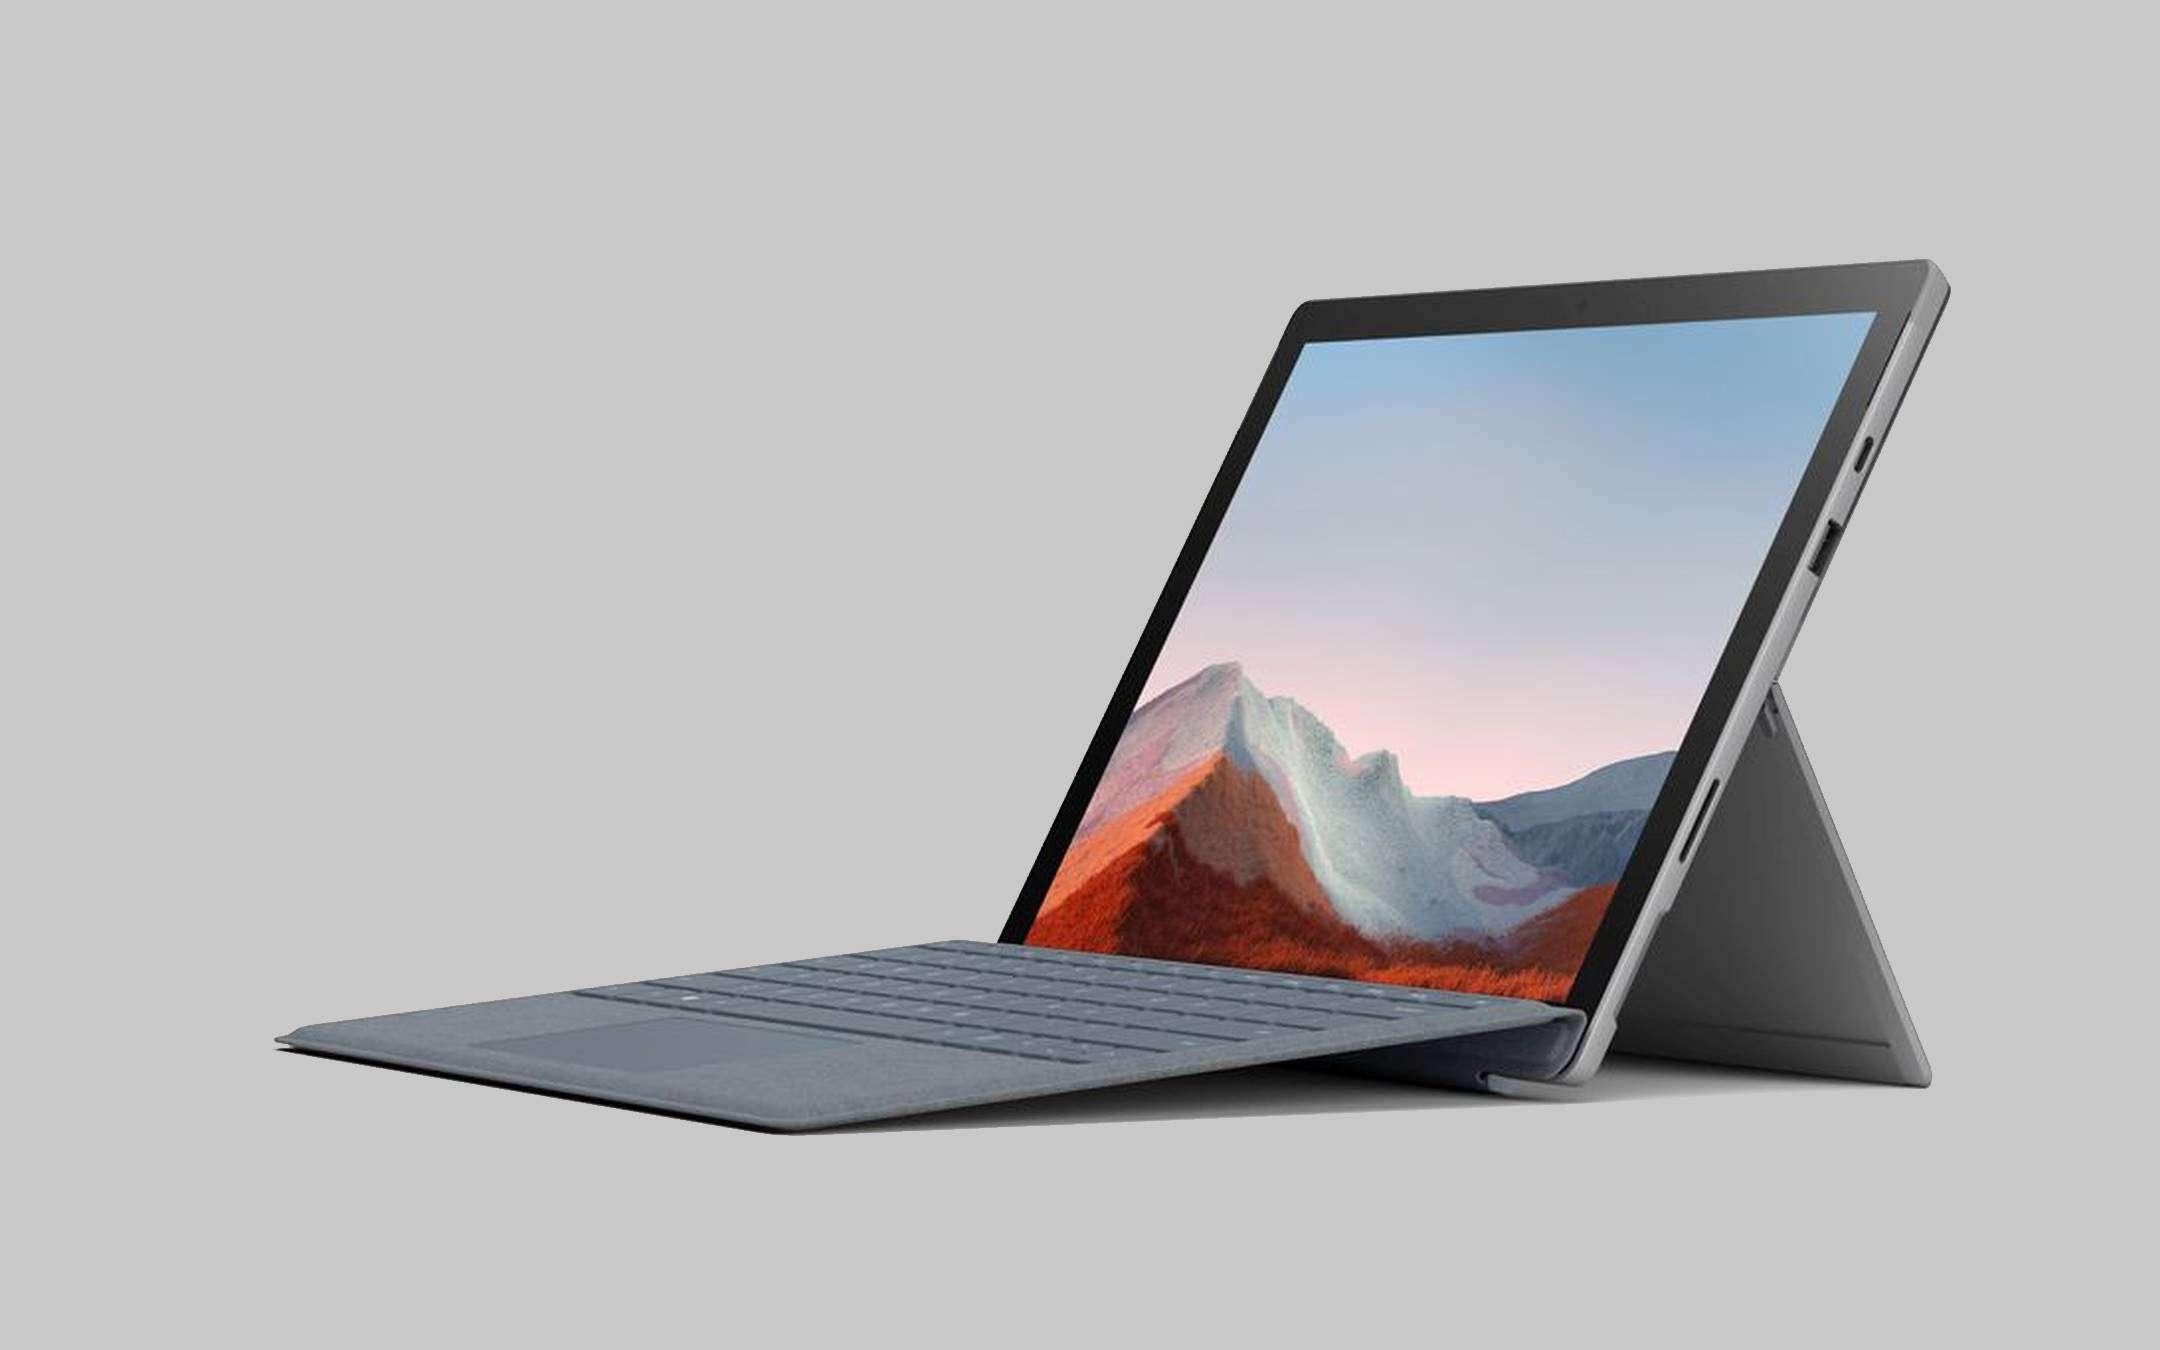 Surface Pro 7 Plus: Microsoft sells SSDs